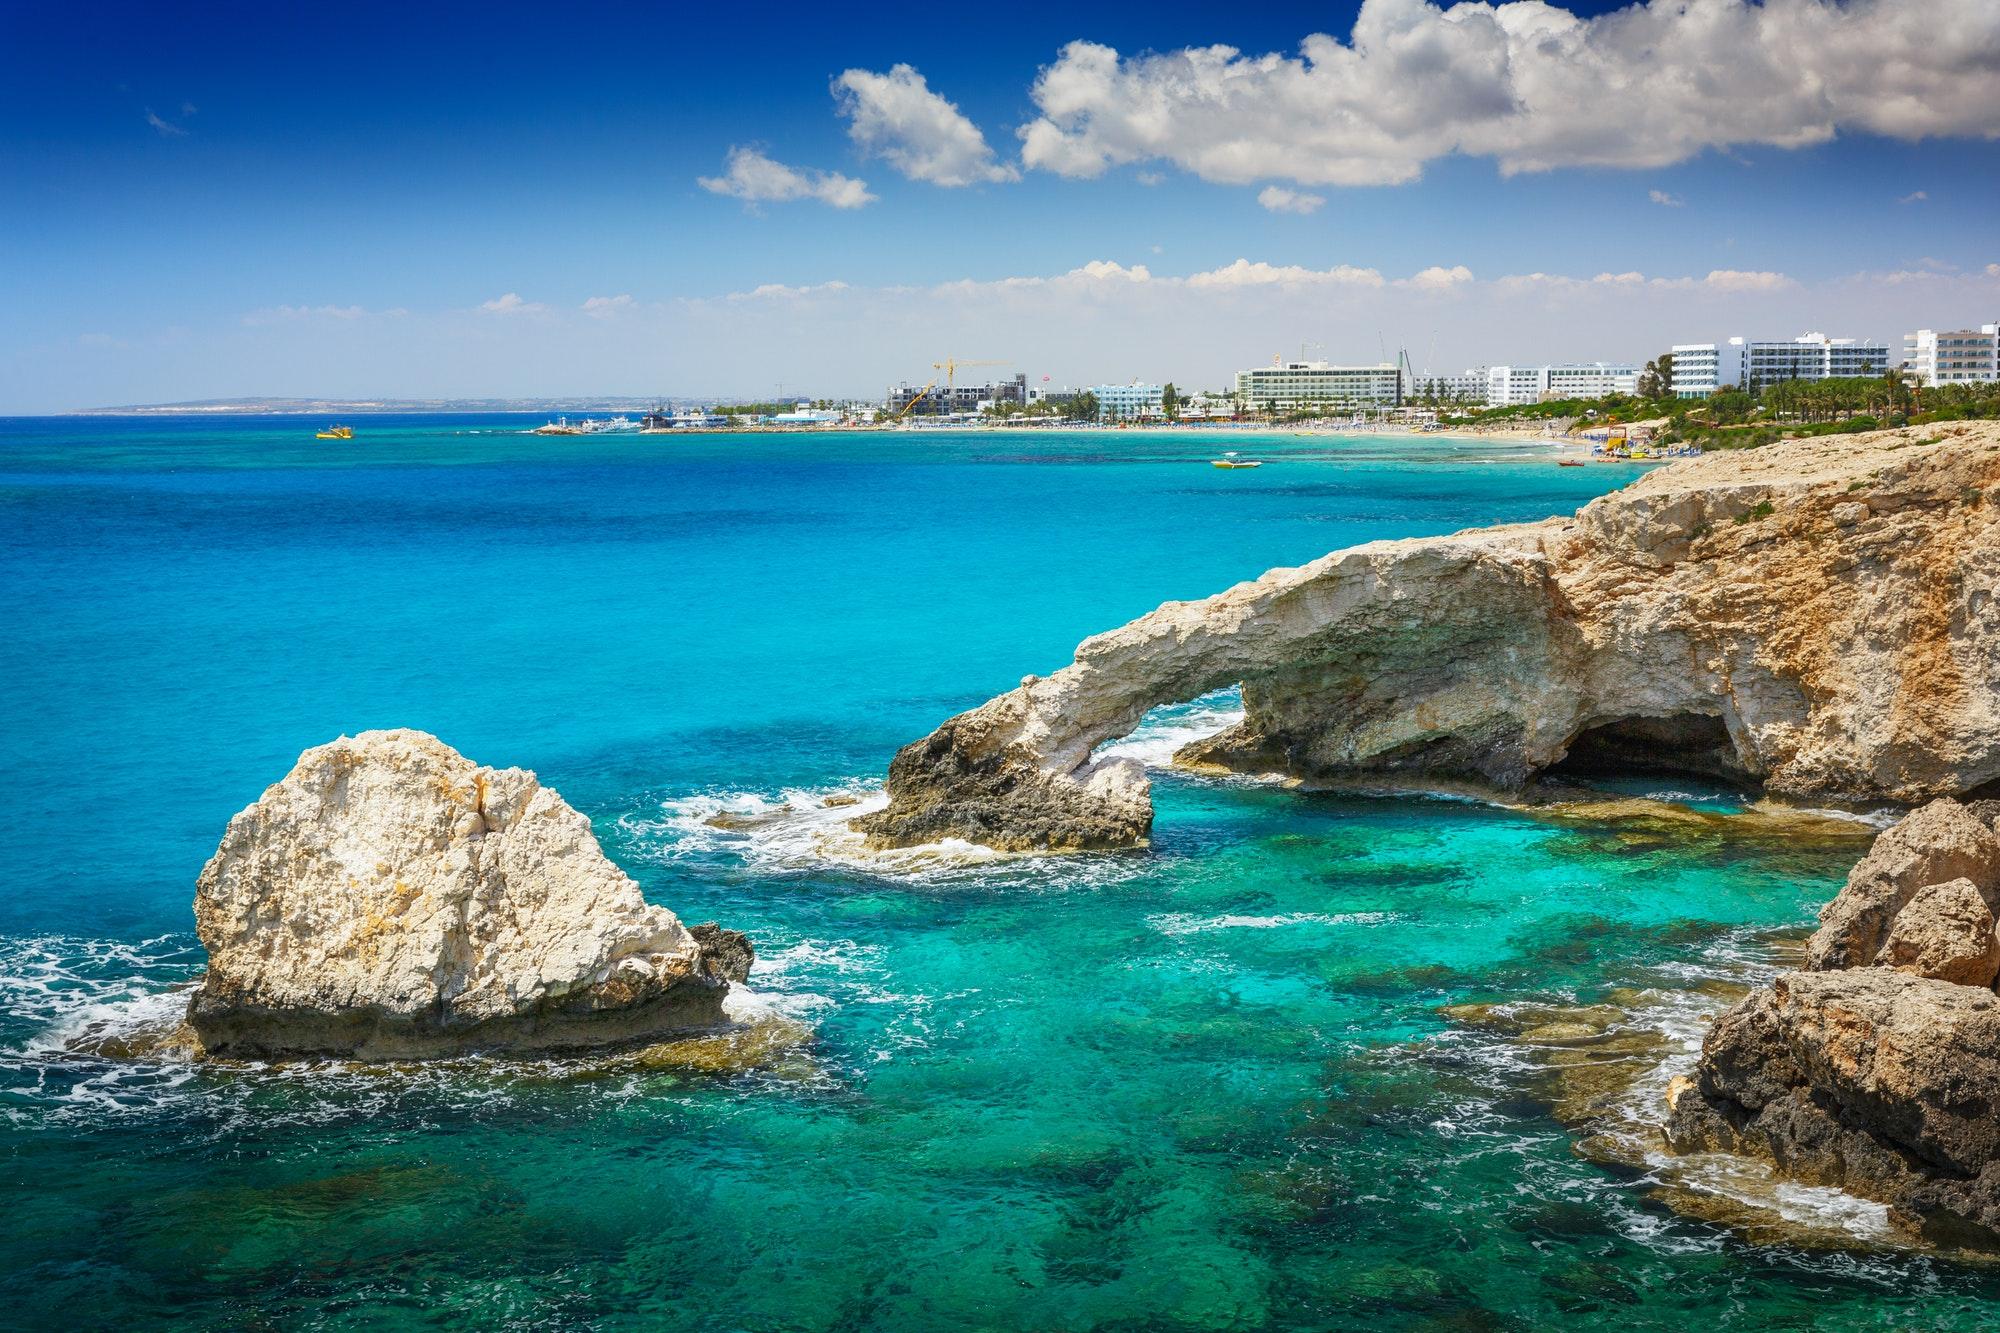 Bridge Lovers Near Ayia Napa, Cyprus